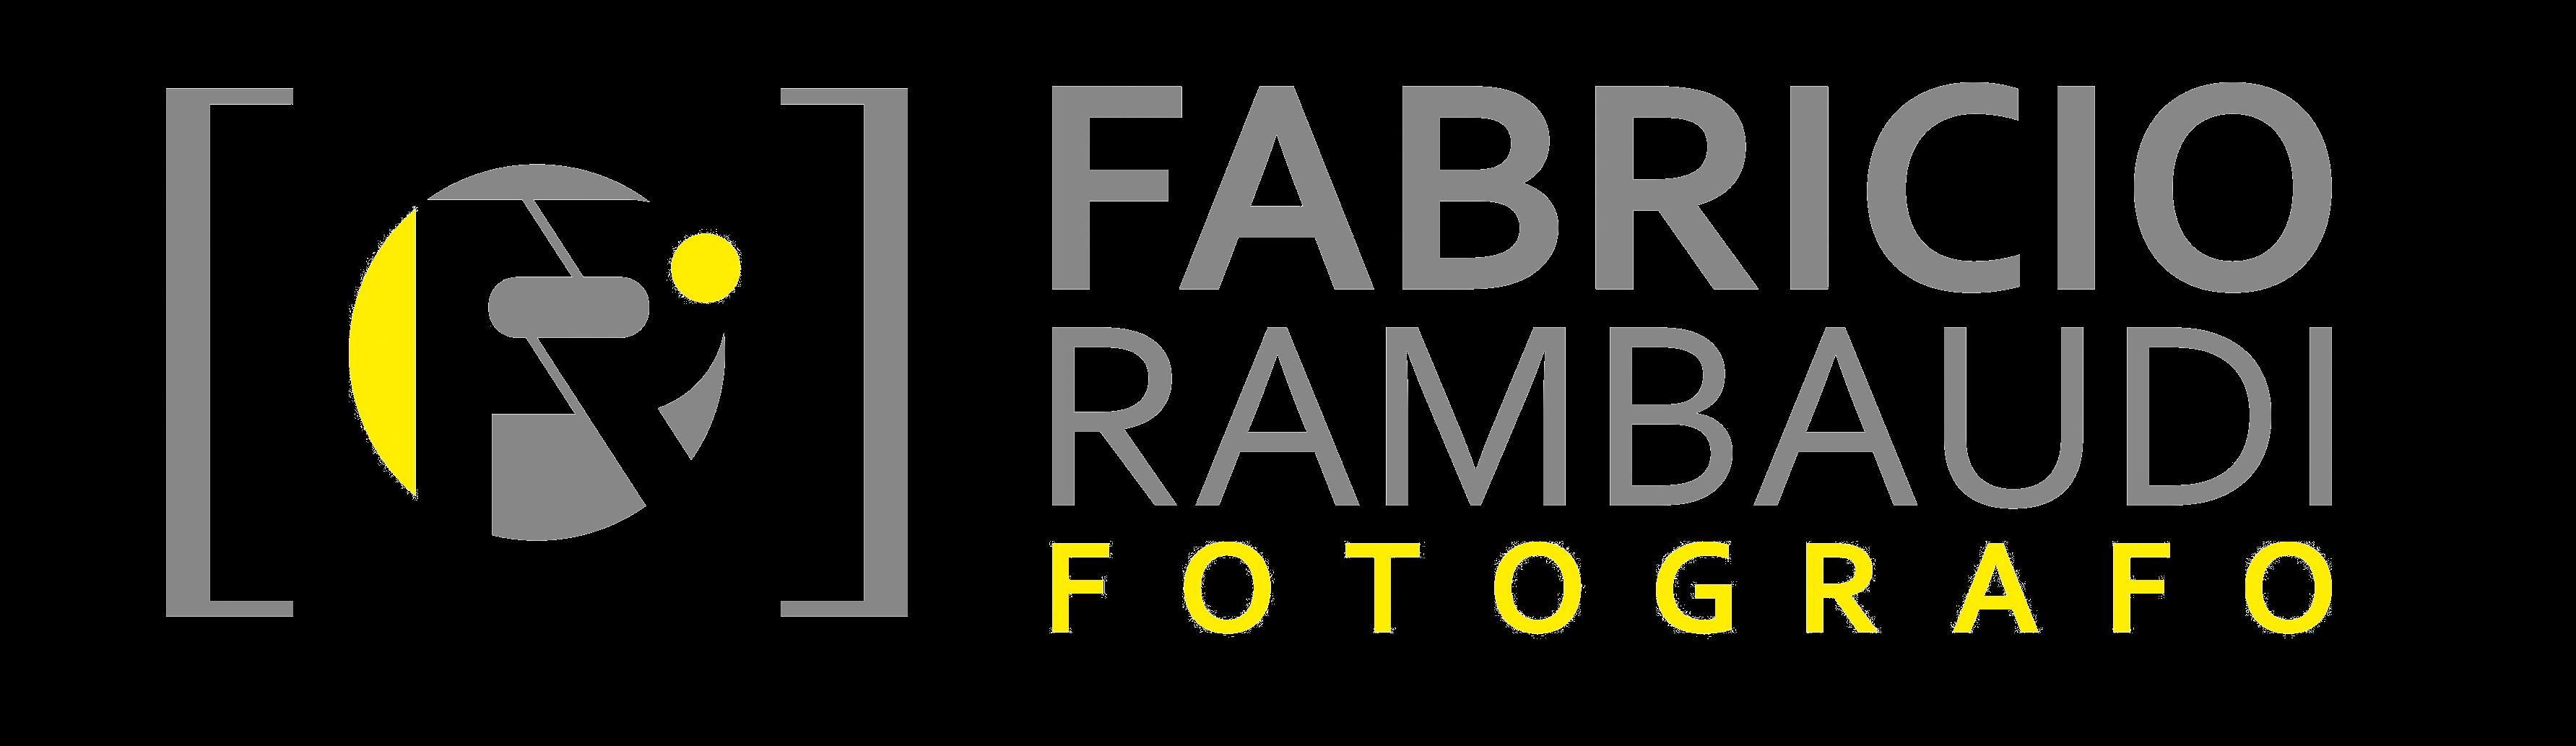 Fabricio Rambaudi Fotógrafo